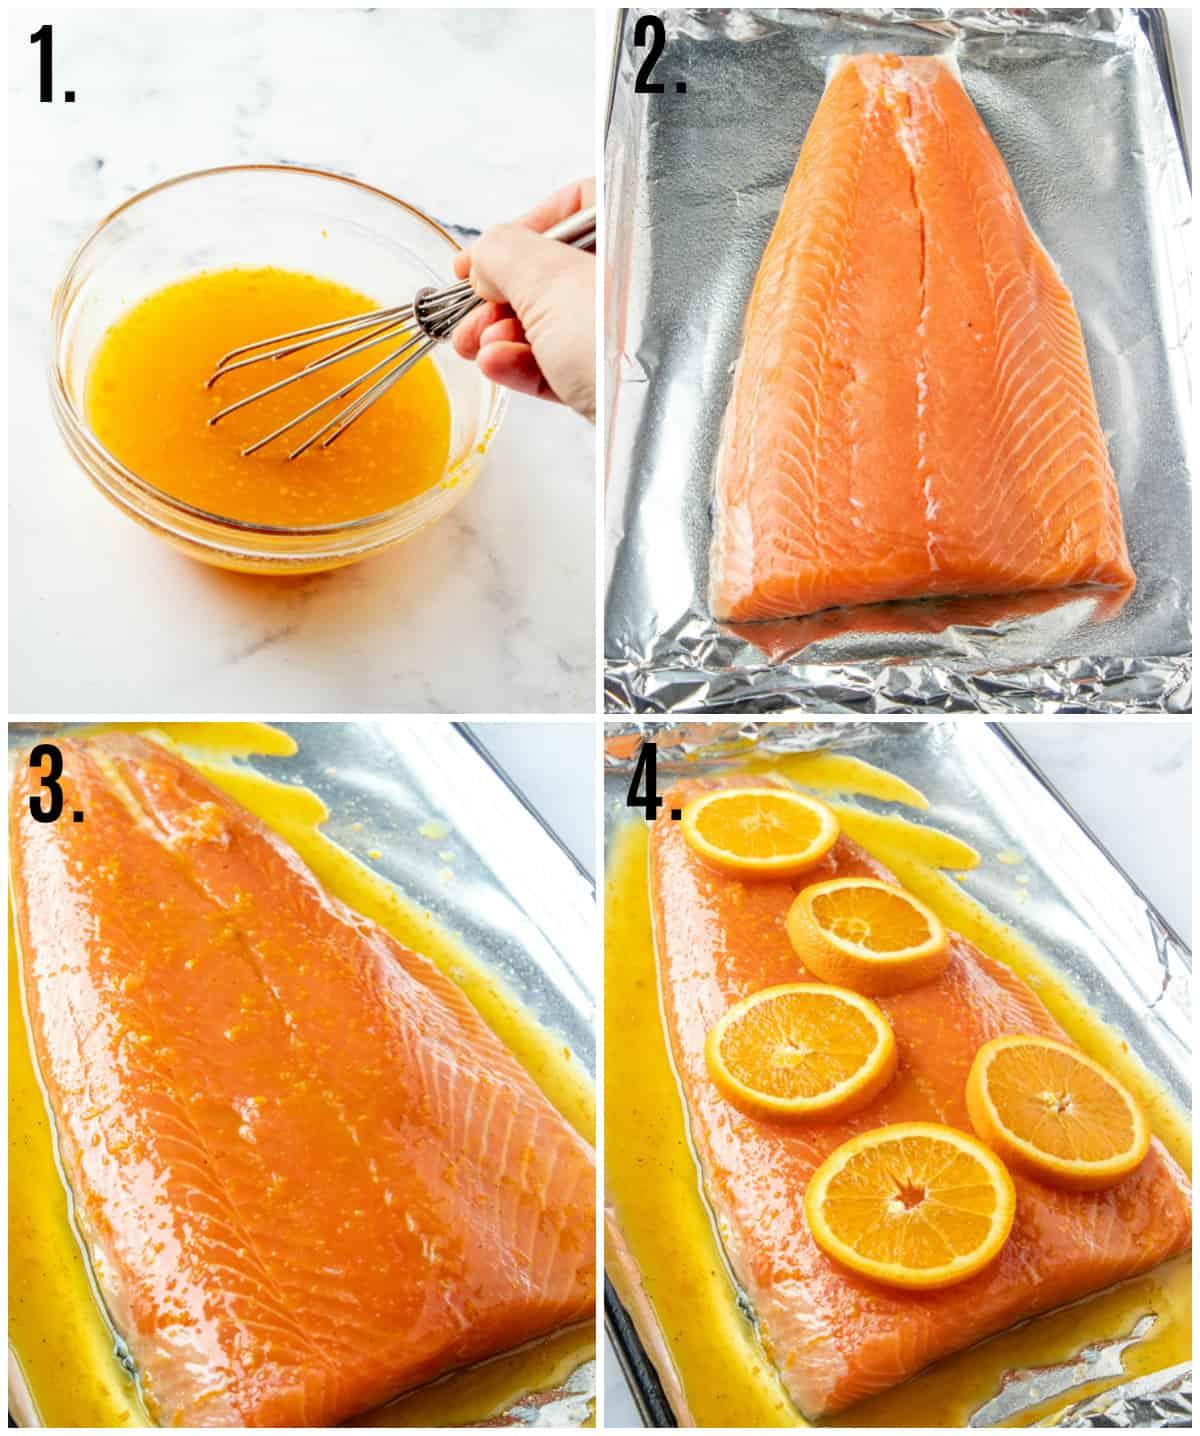 Step by step photos on how to make orange glazed salmon